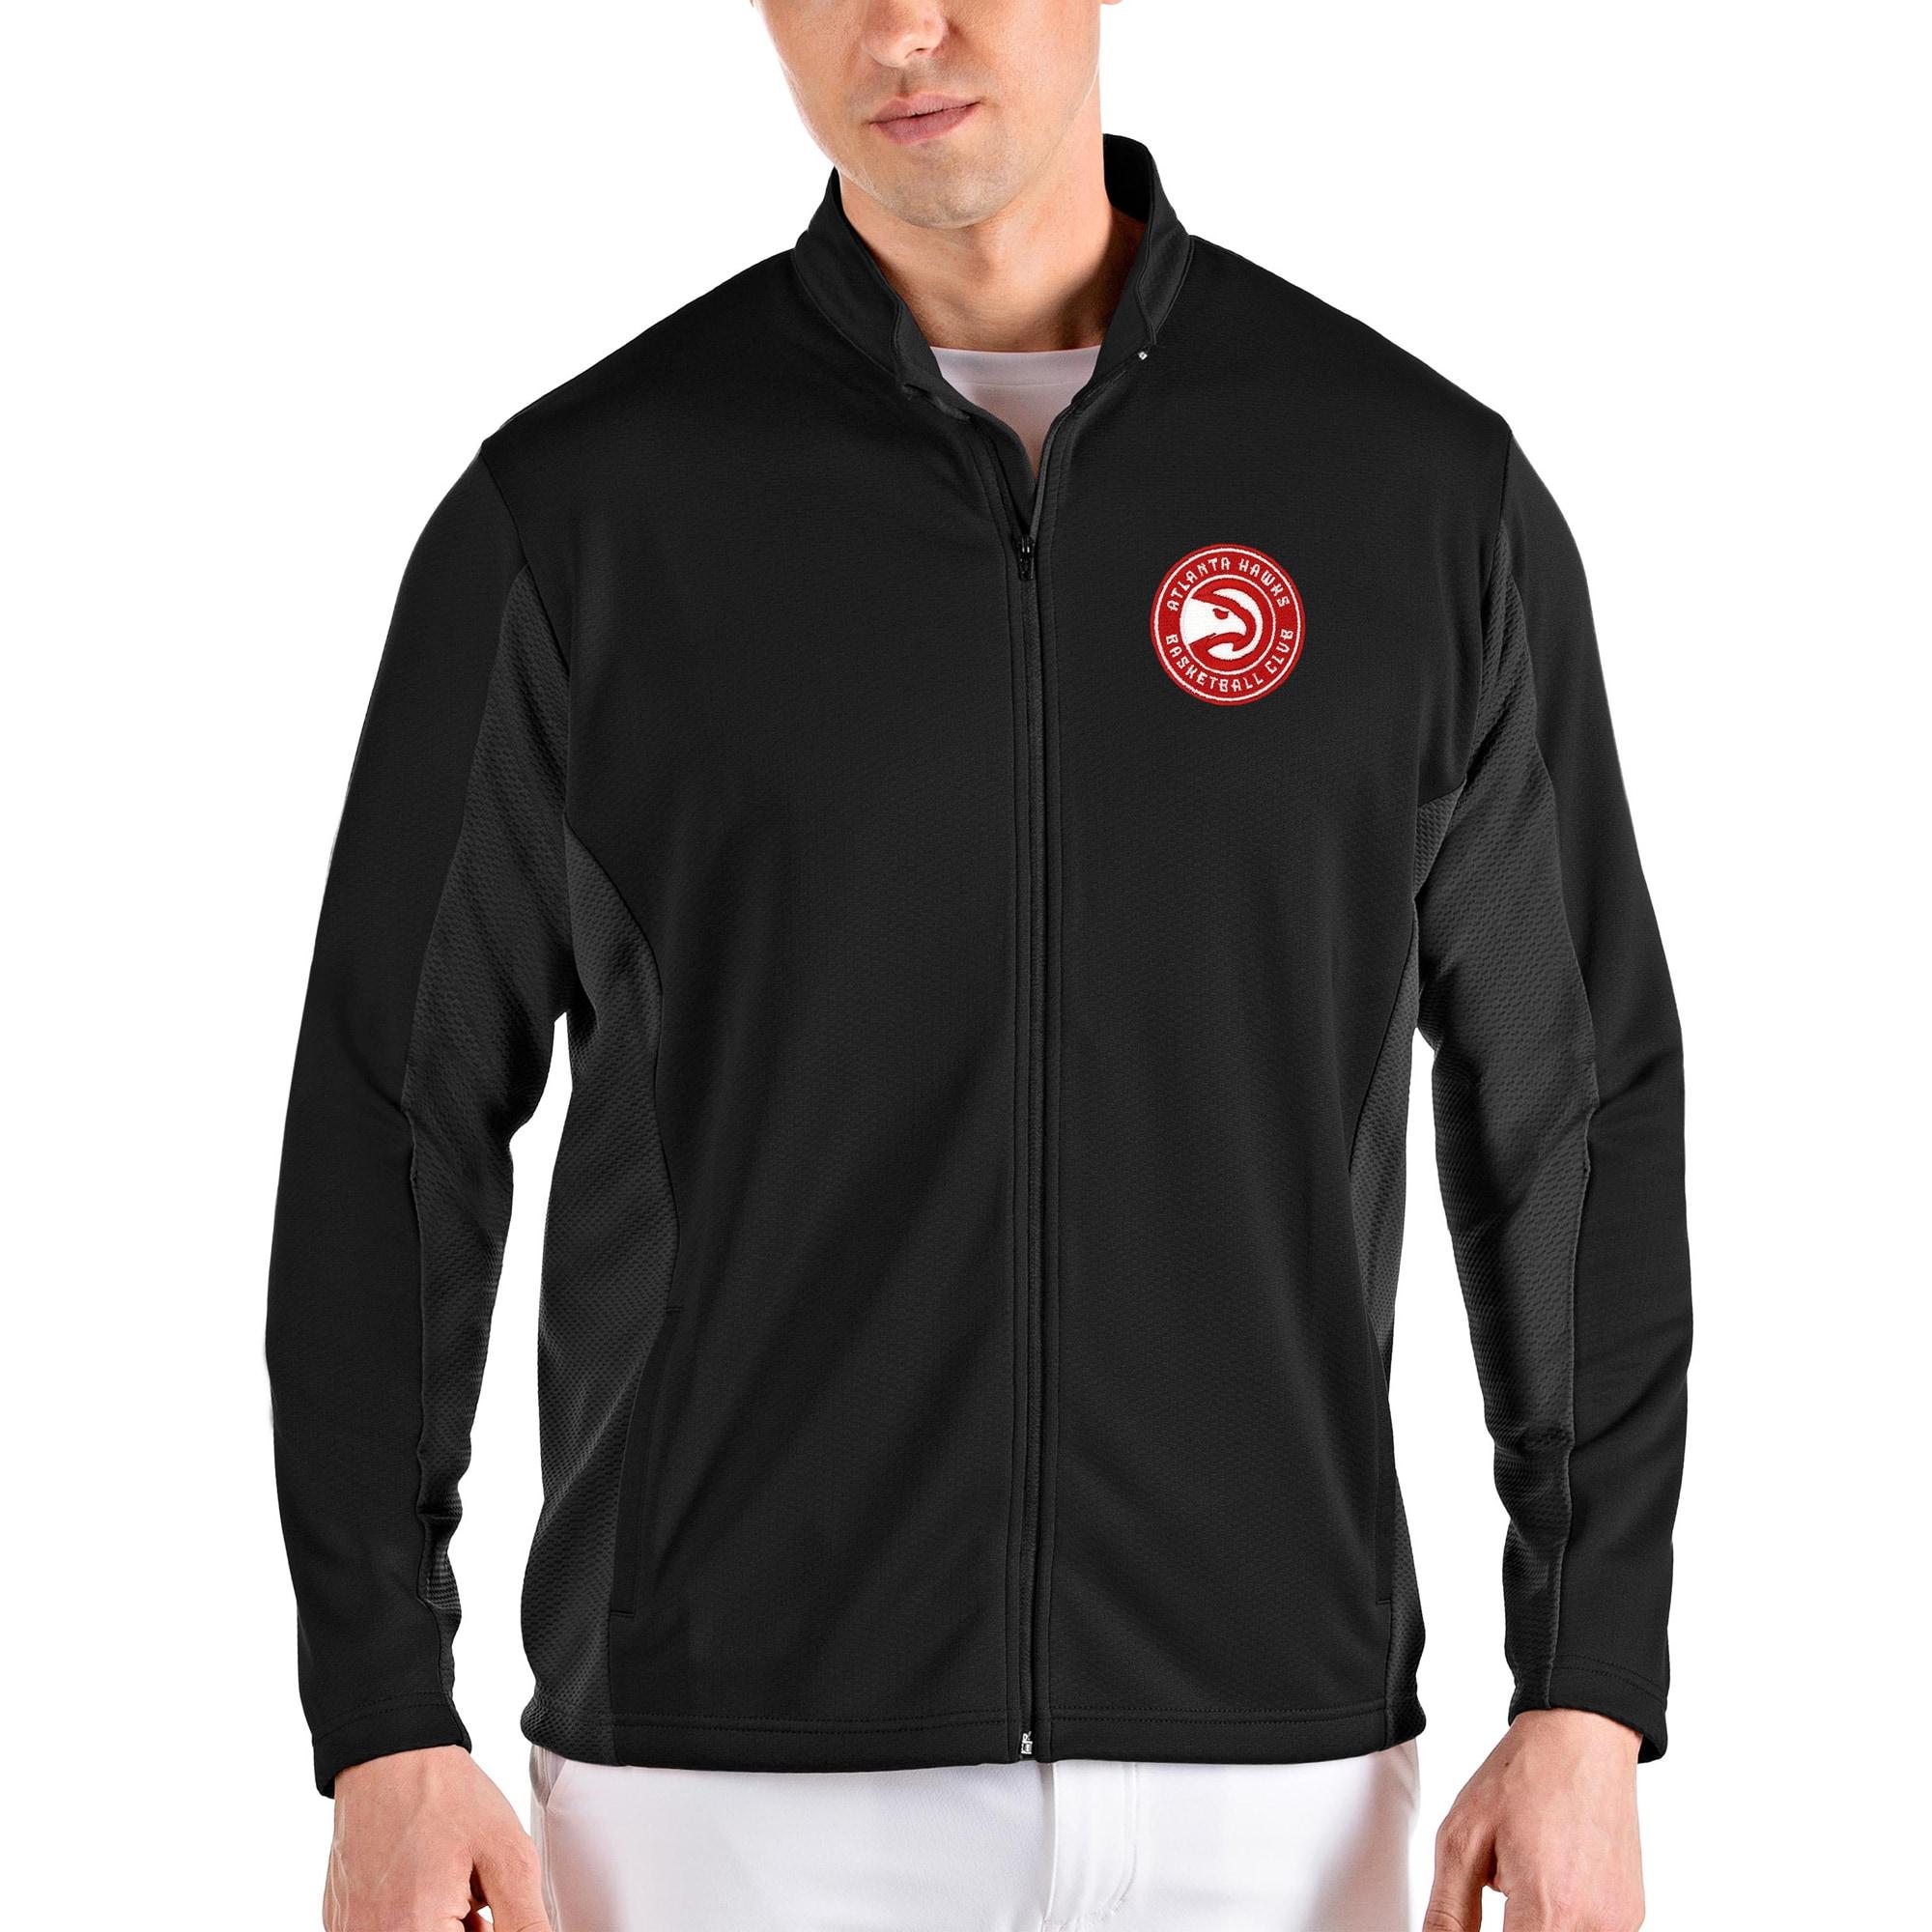 Atlanta Hawks Antigua Passage Full-Zip Jacket - Black/Gray